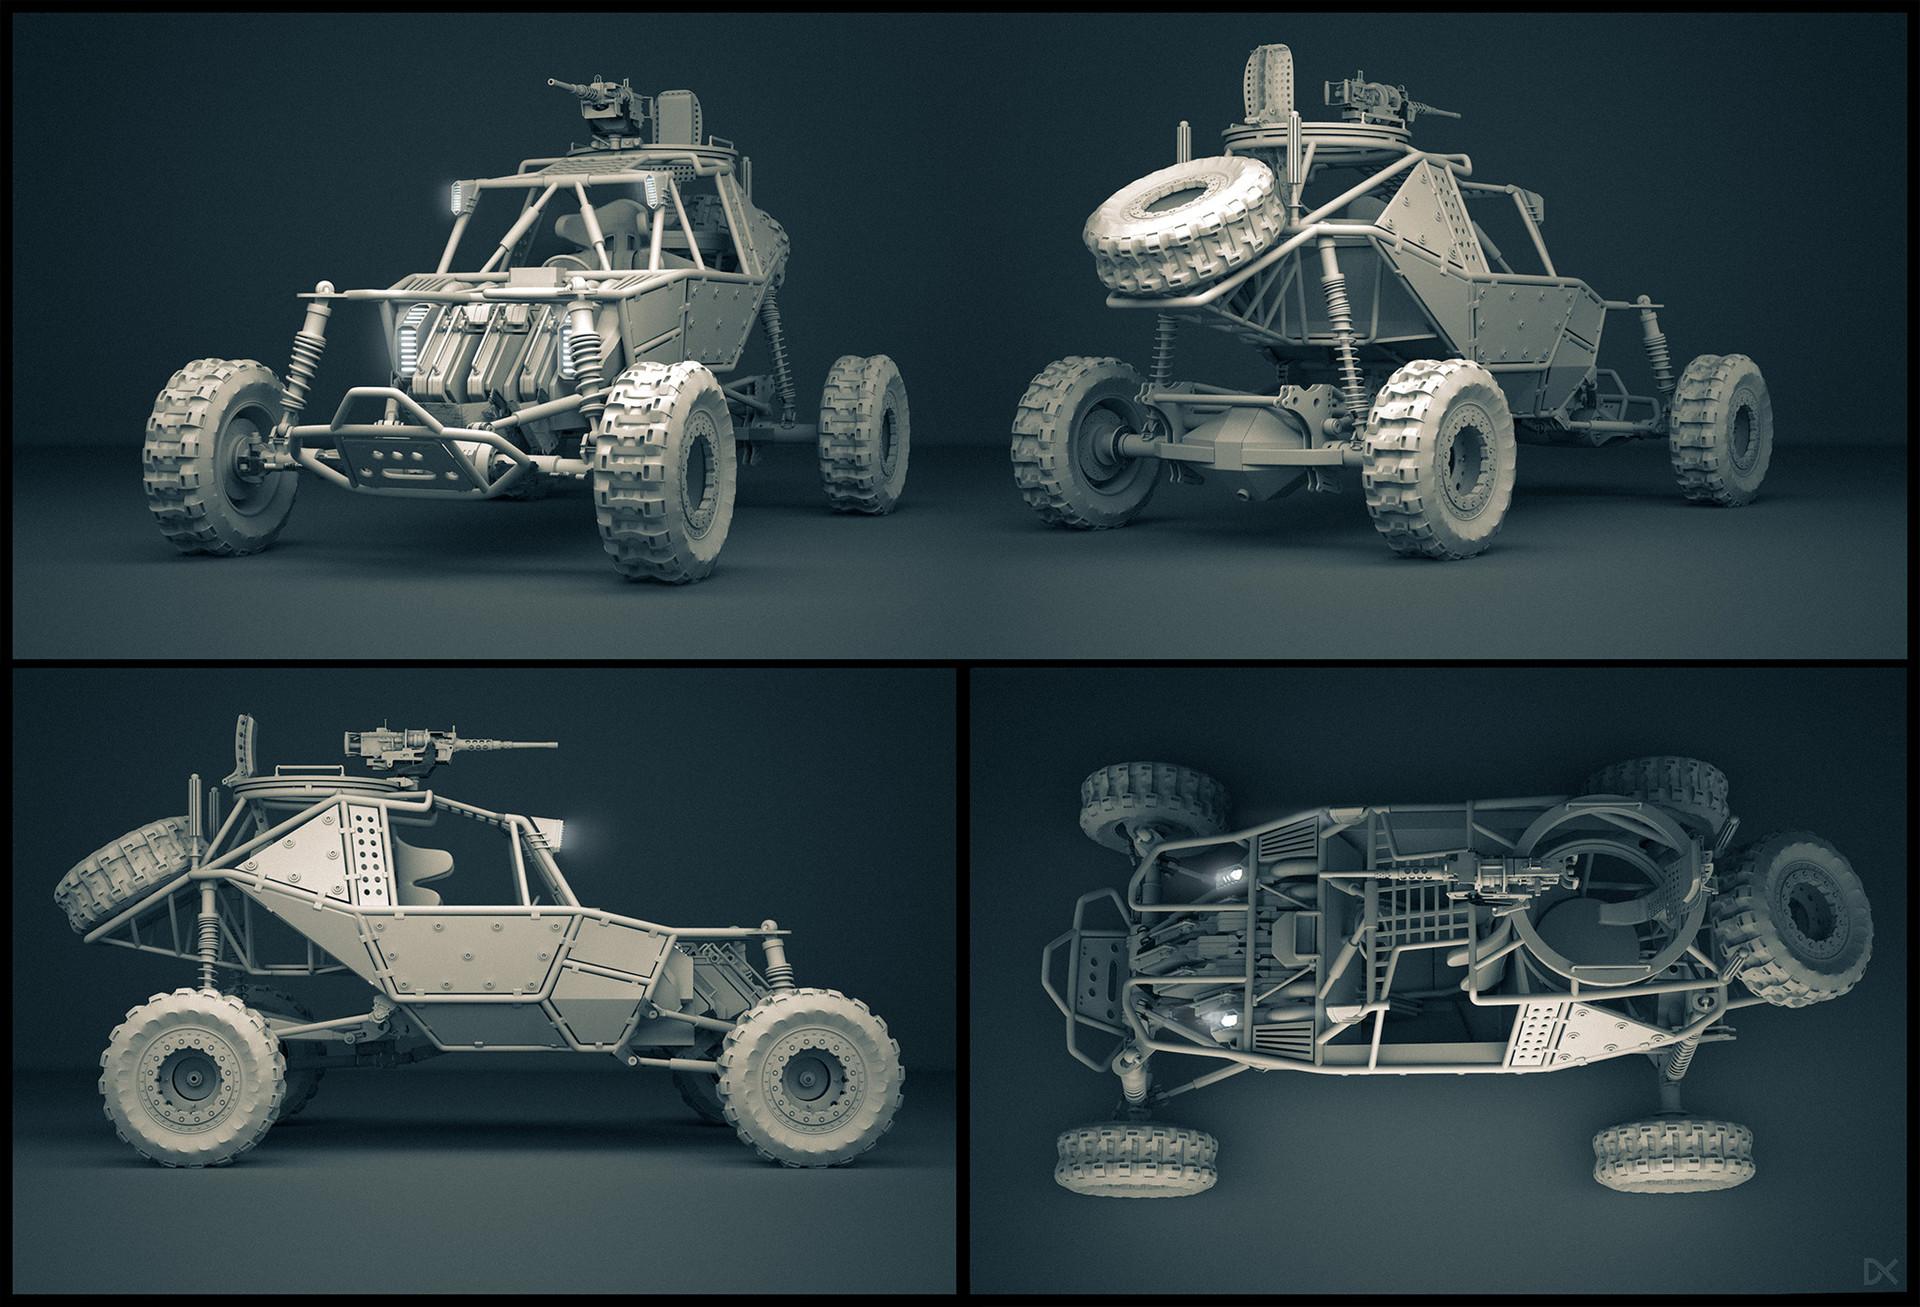 Darius kalinauskas buggy conceptart vehicle jungle abandoned clay render 2k